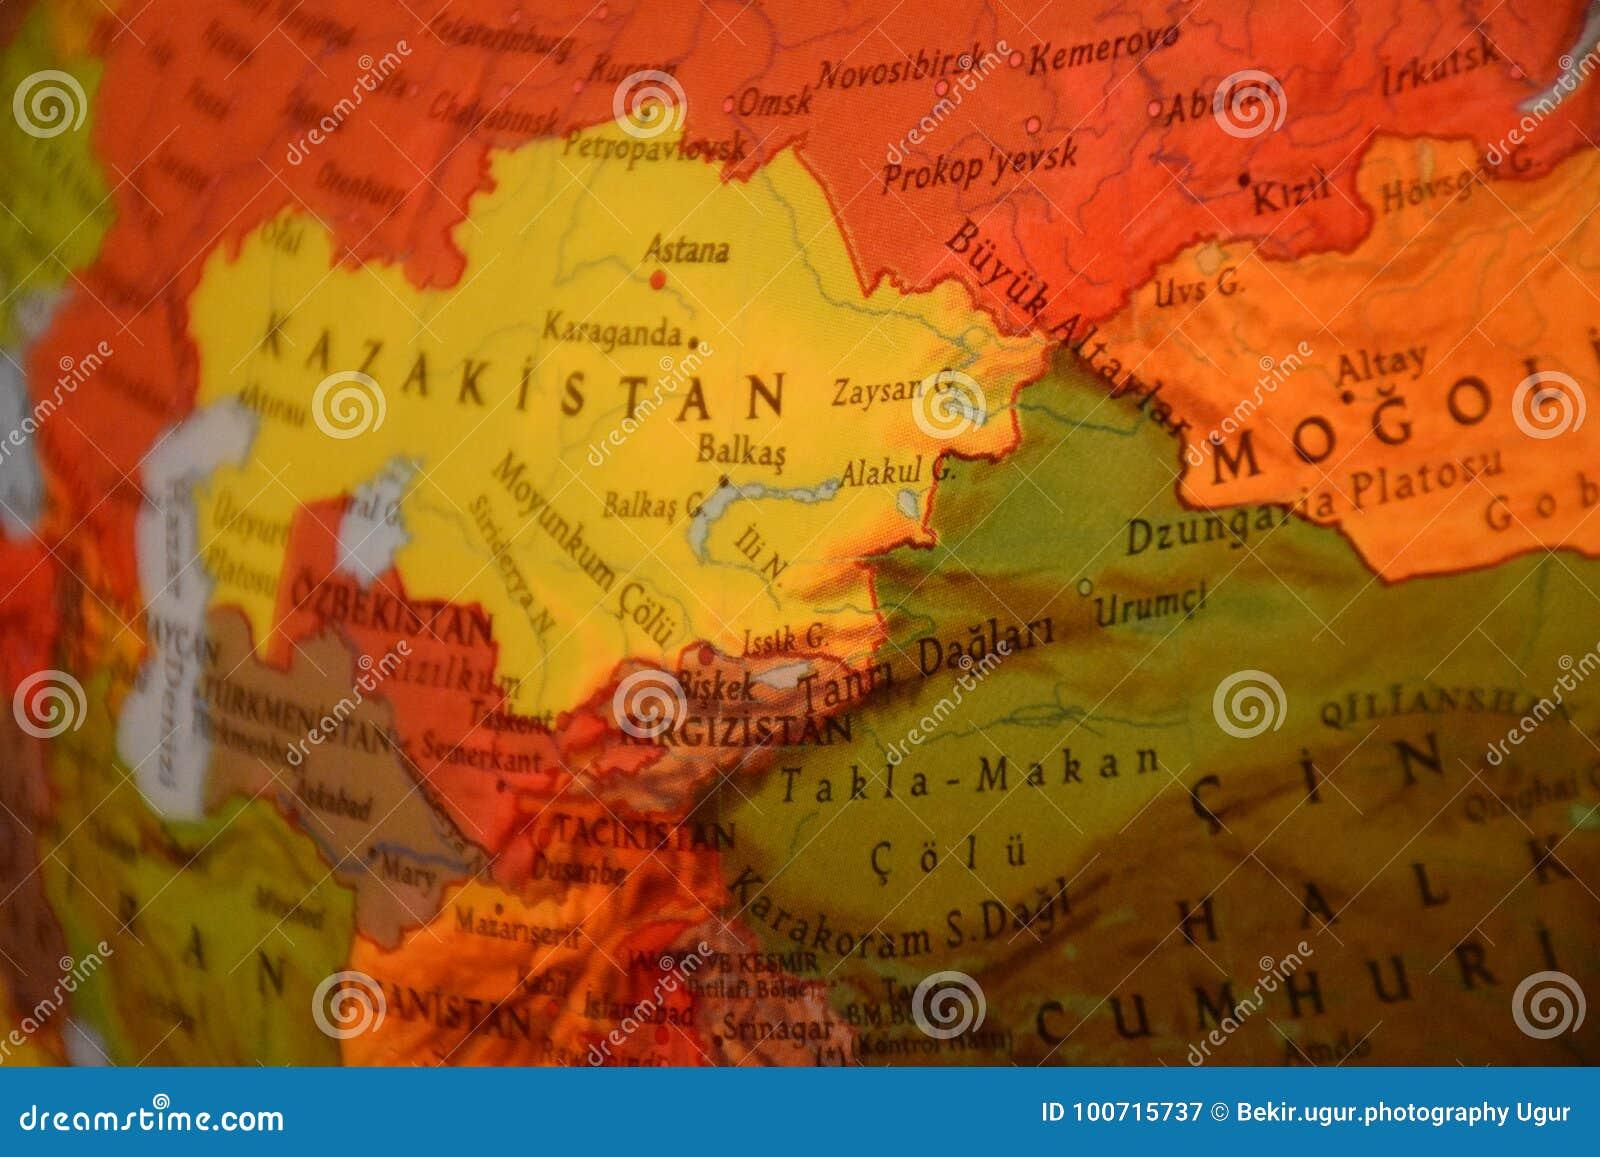 Geography Map Of England.Globe Kazakhstan Mongolian And China Stock Image Image Of Earth